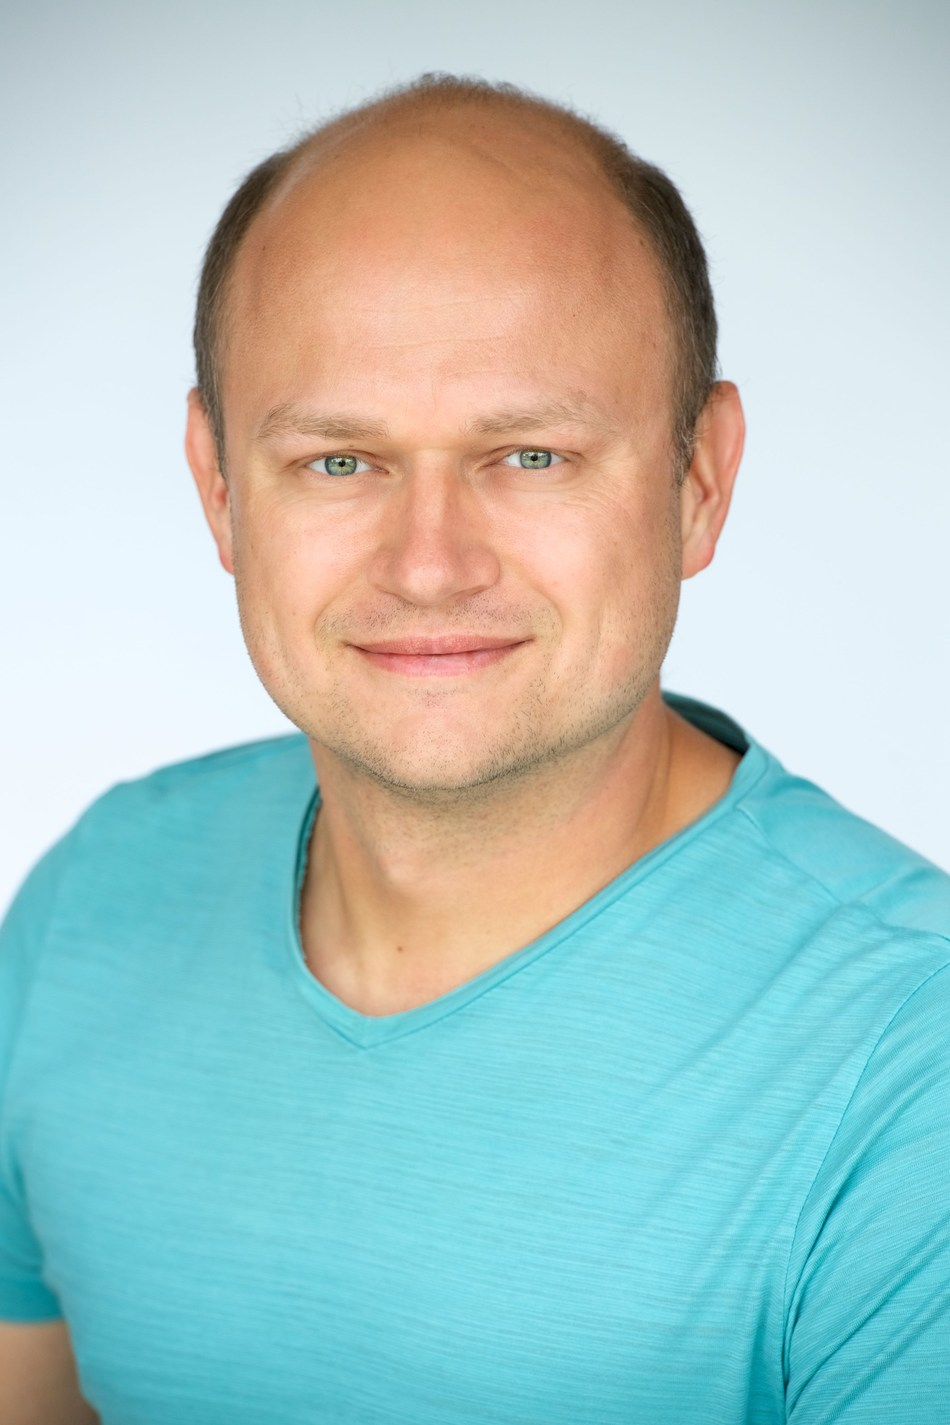 David Pavlík leaves SpaceX to join Kiwi.com as Chief Information Officer (PRNewsfoto/Kiwi.com)